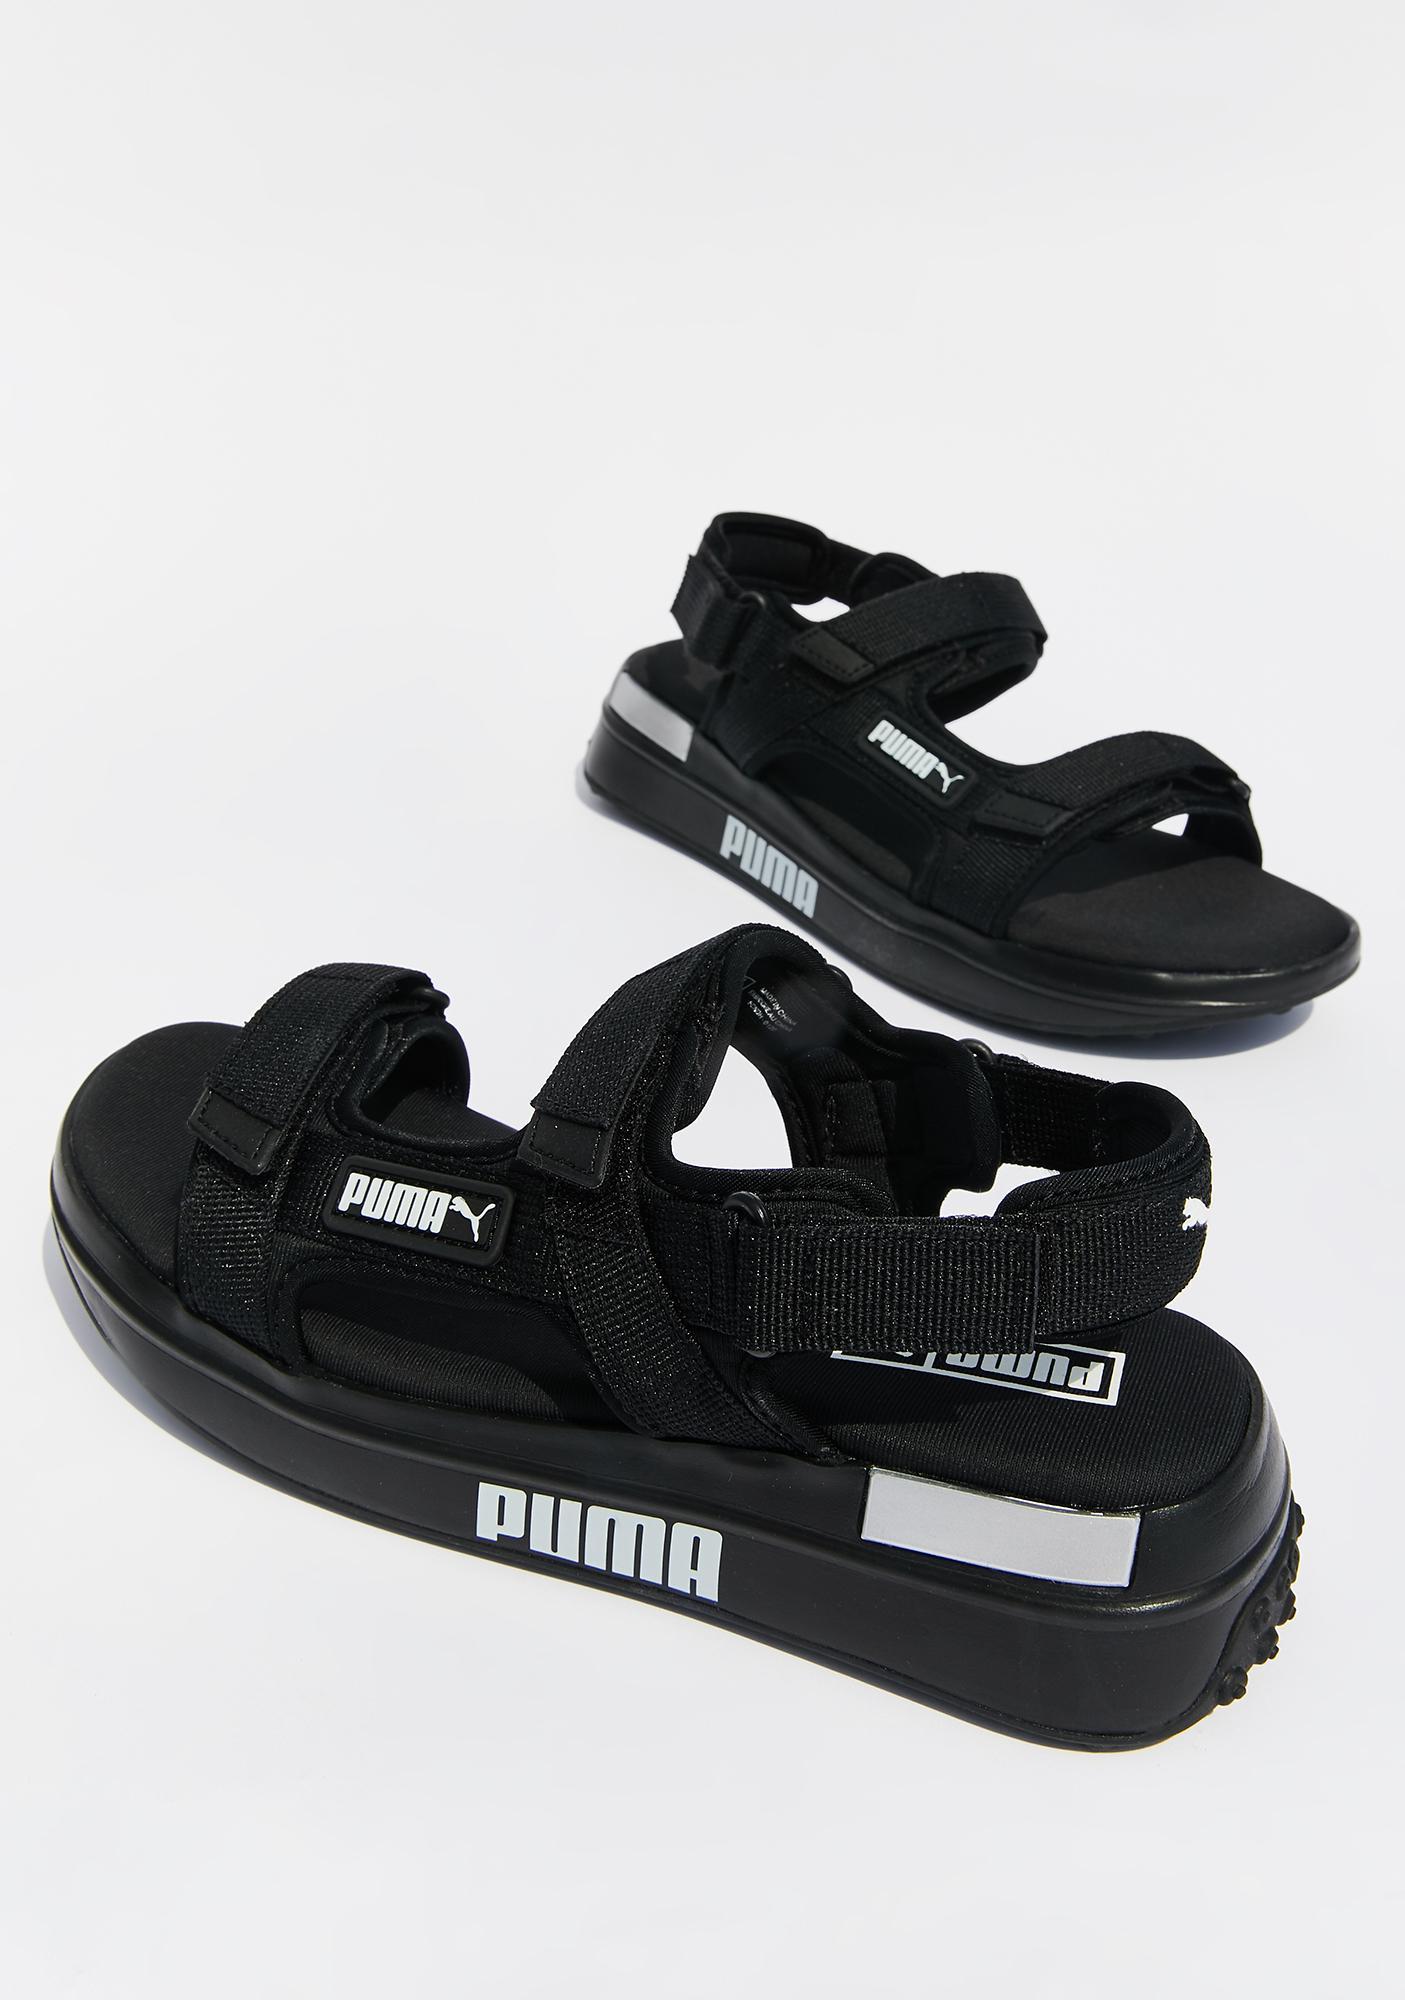 black puma sandals